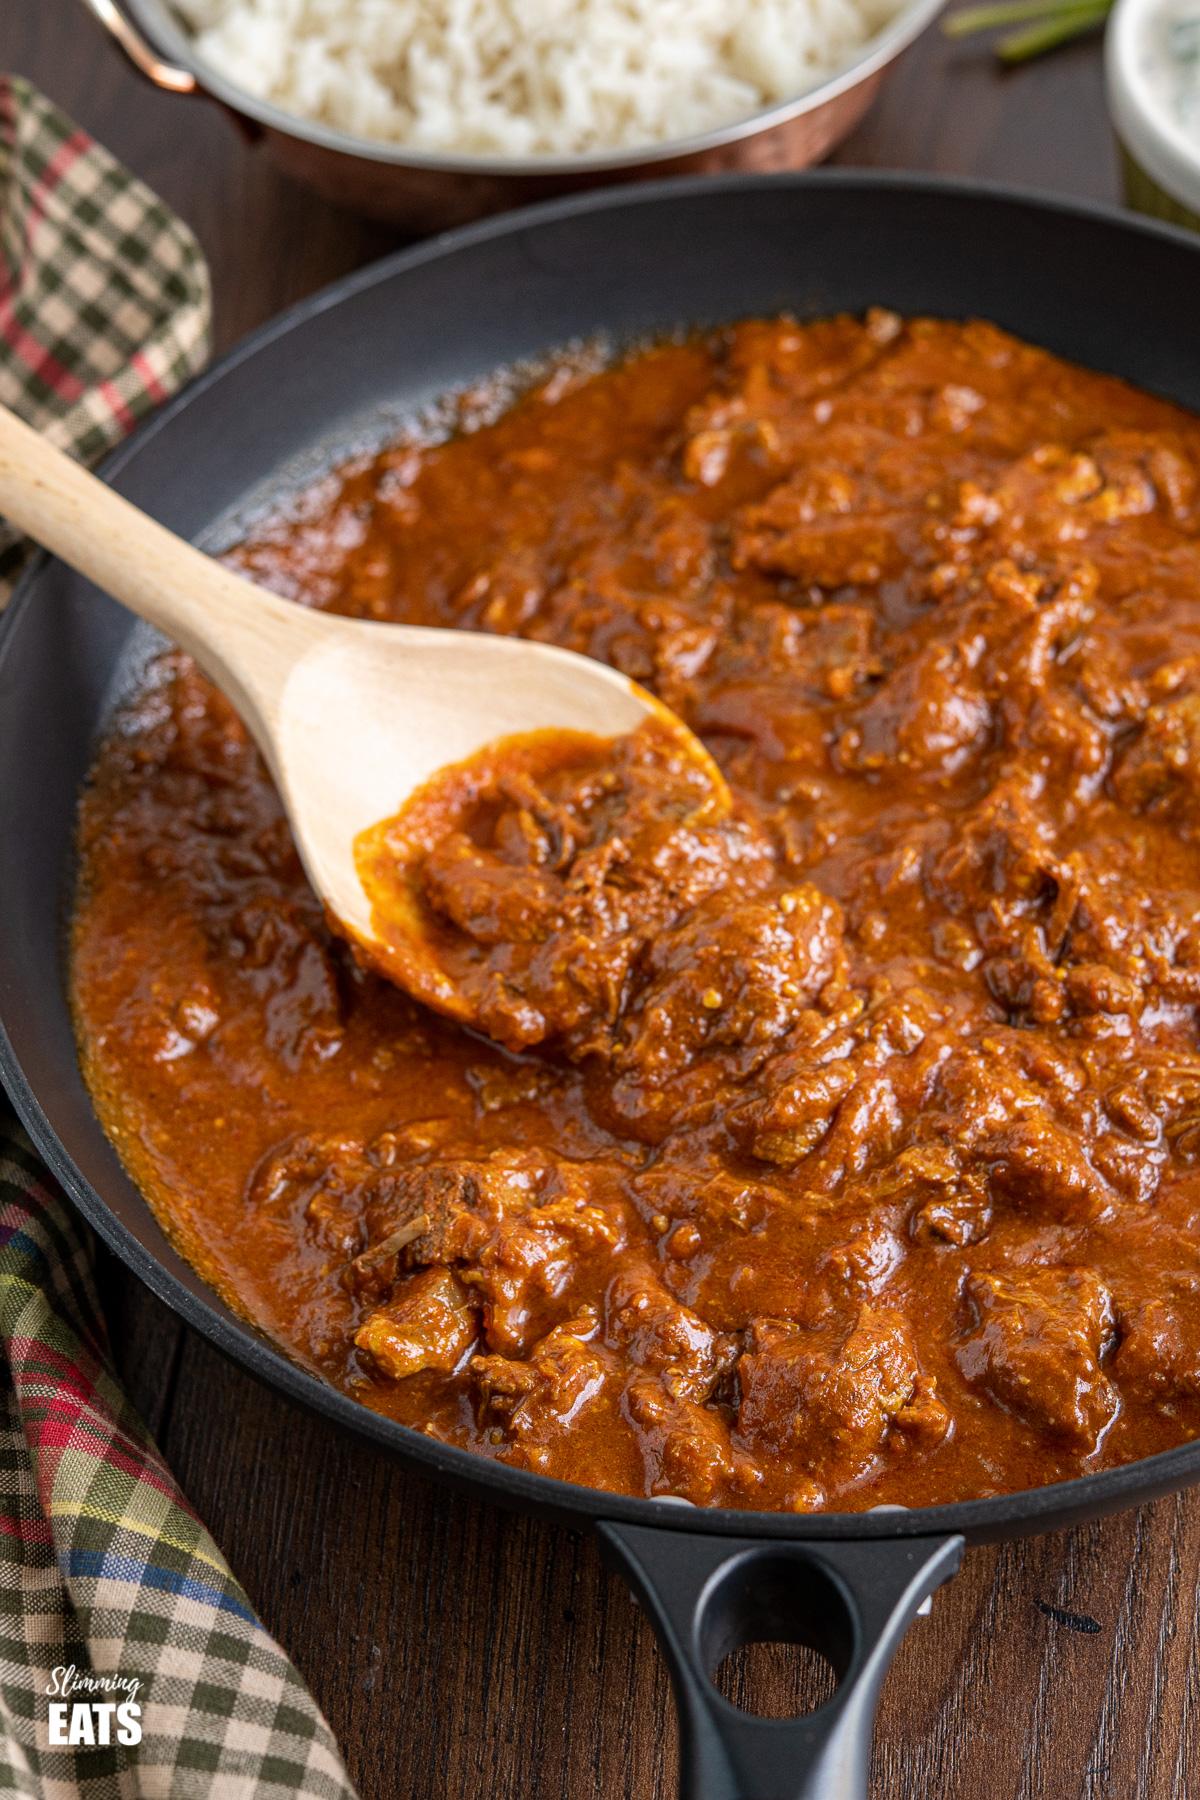 lamb rogan josh in black frying pan with wooden spoon, rice in background in metal dish